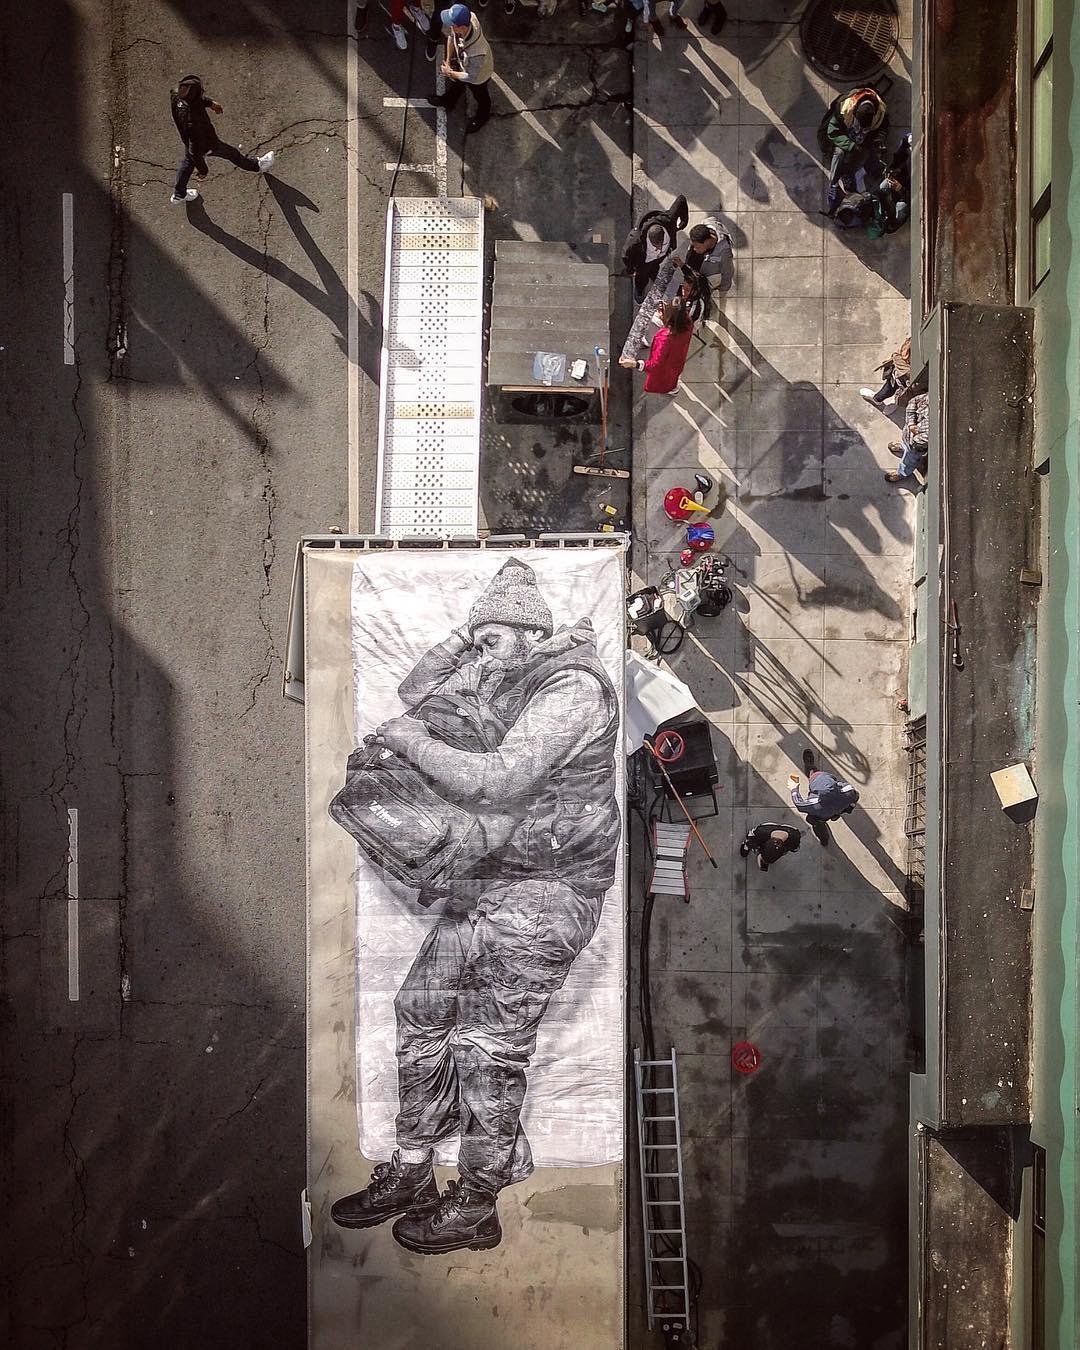 JR-San-Francisco-Project-art-1.jpg